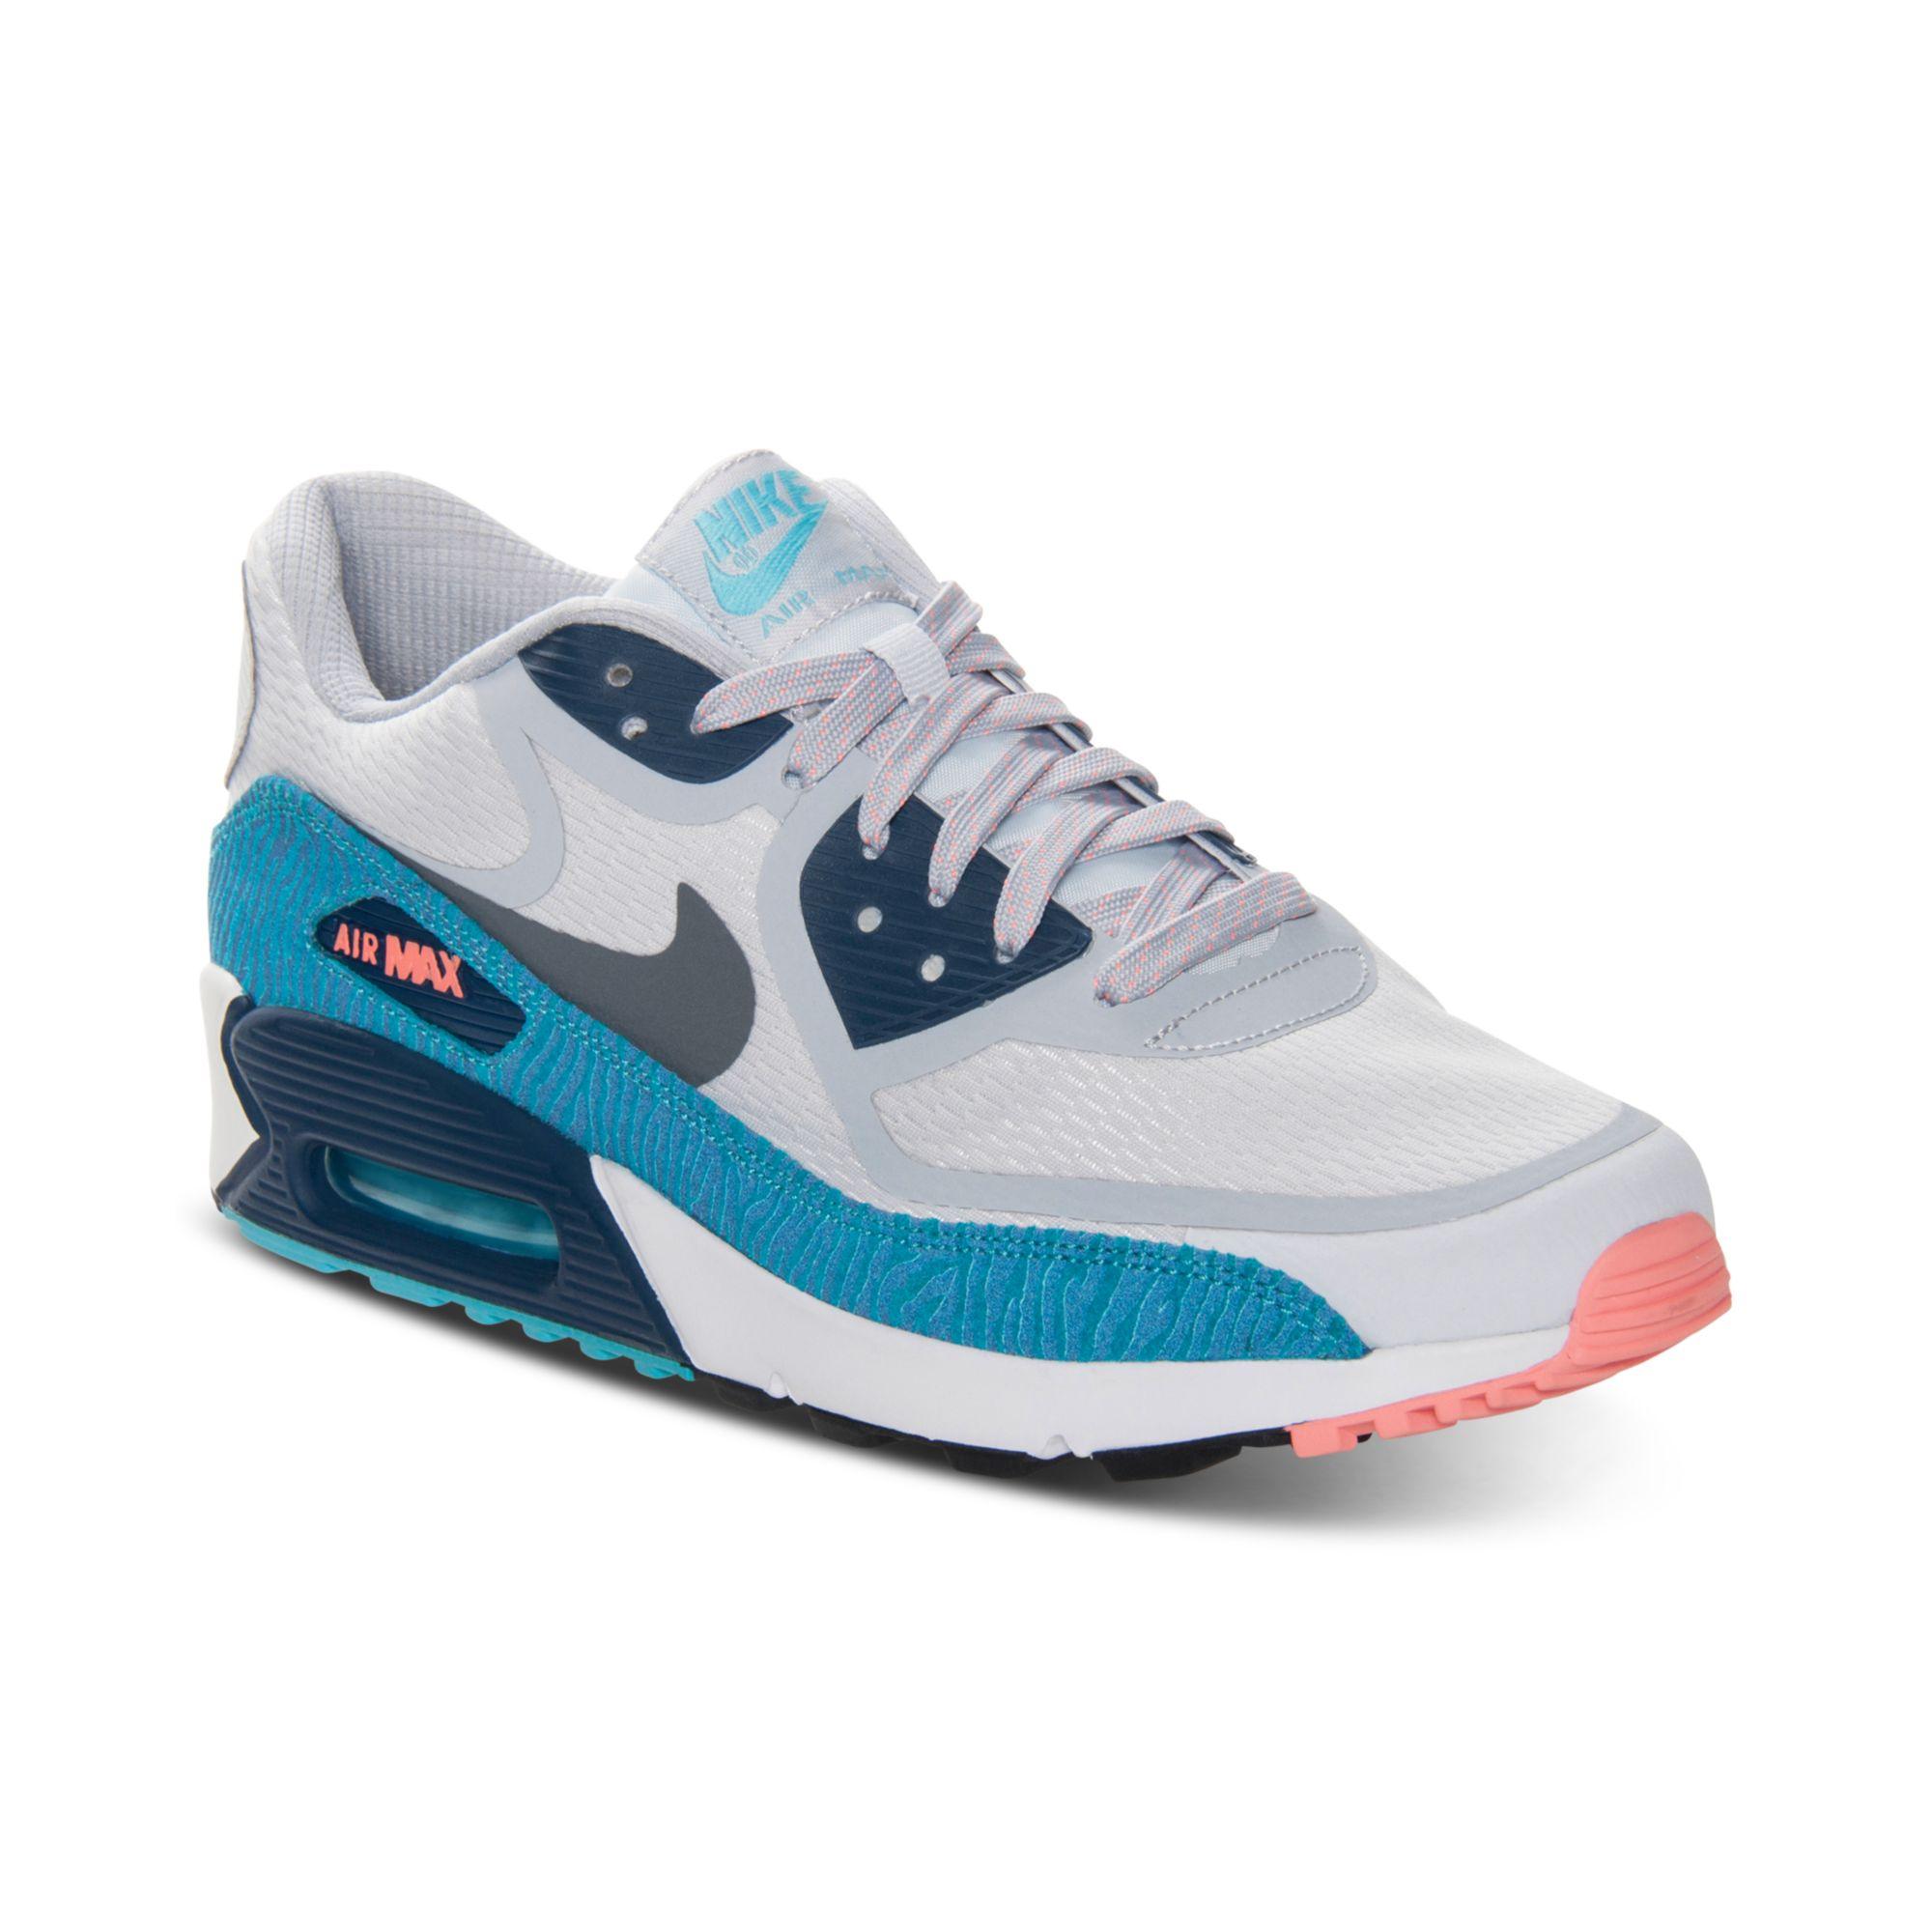 Nike Flex Experience Run 5 Men's Running Shoes - Kohl's